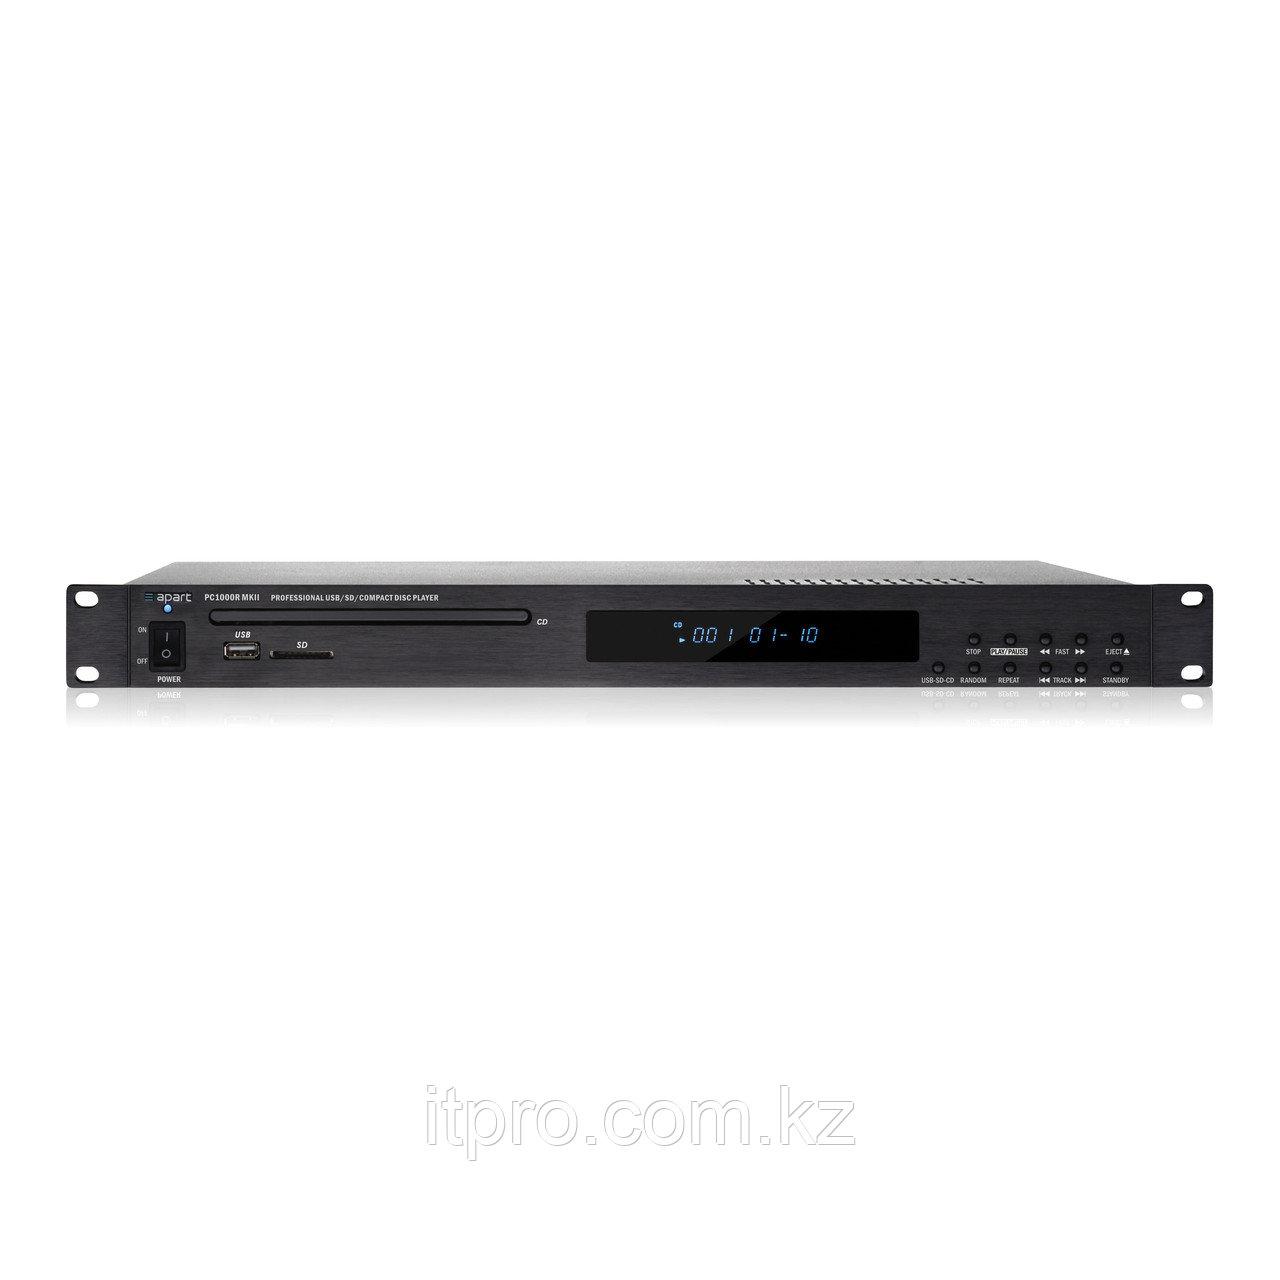 Apart PC1000RMKII. CD/MP3 проигрывватель, USB, SD-карта, контроль по RS232 c д/у